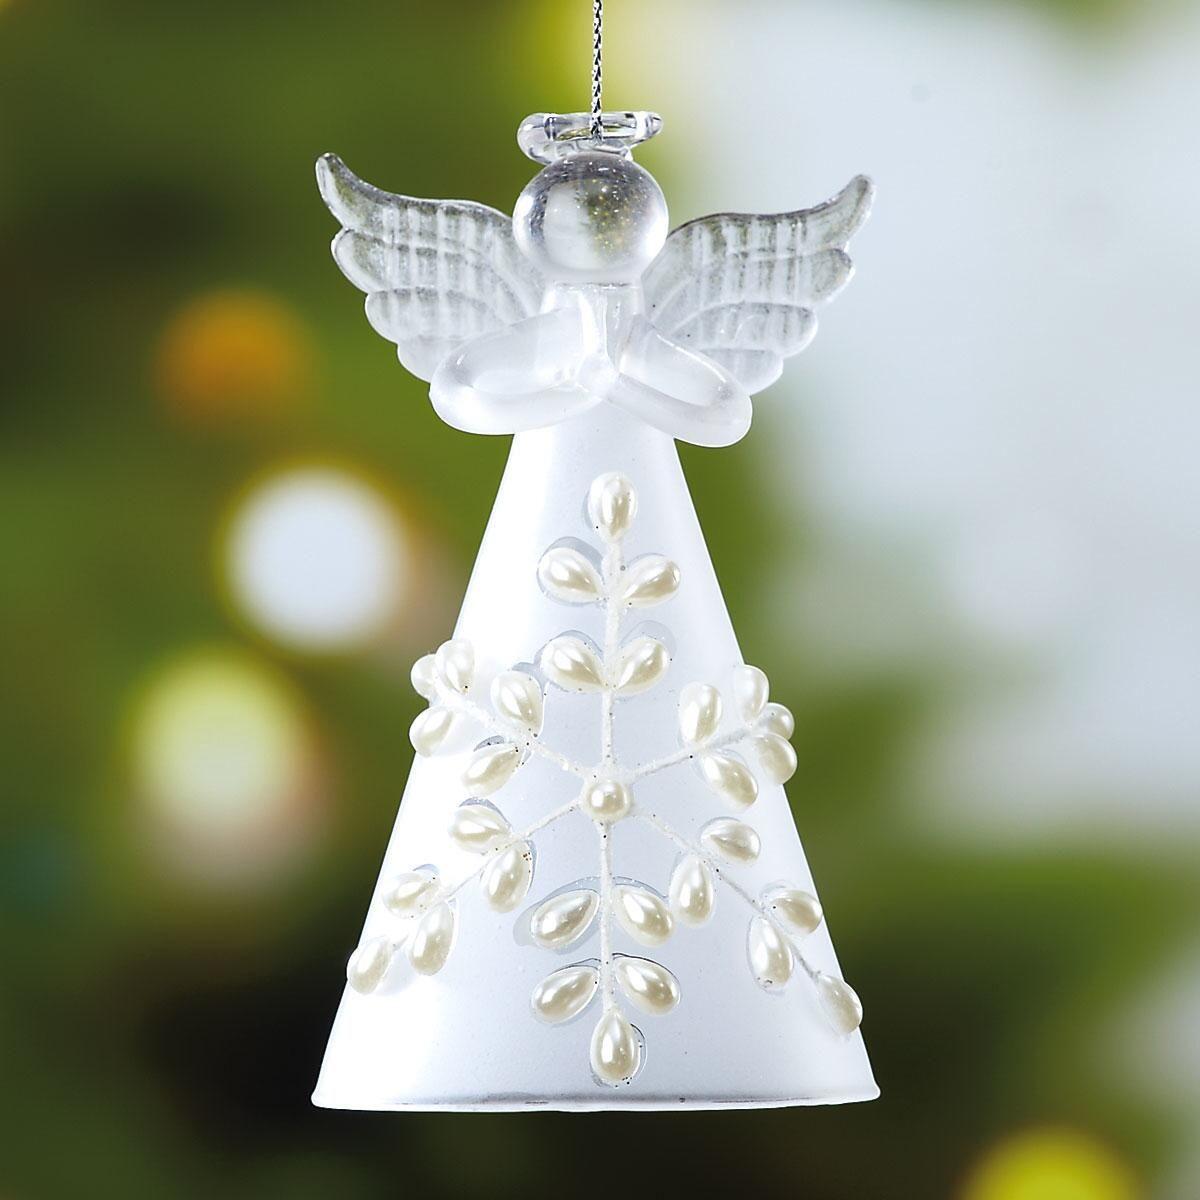 Glass Snow Angel Christmas Ornament